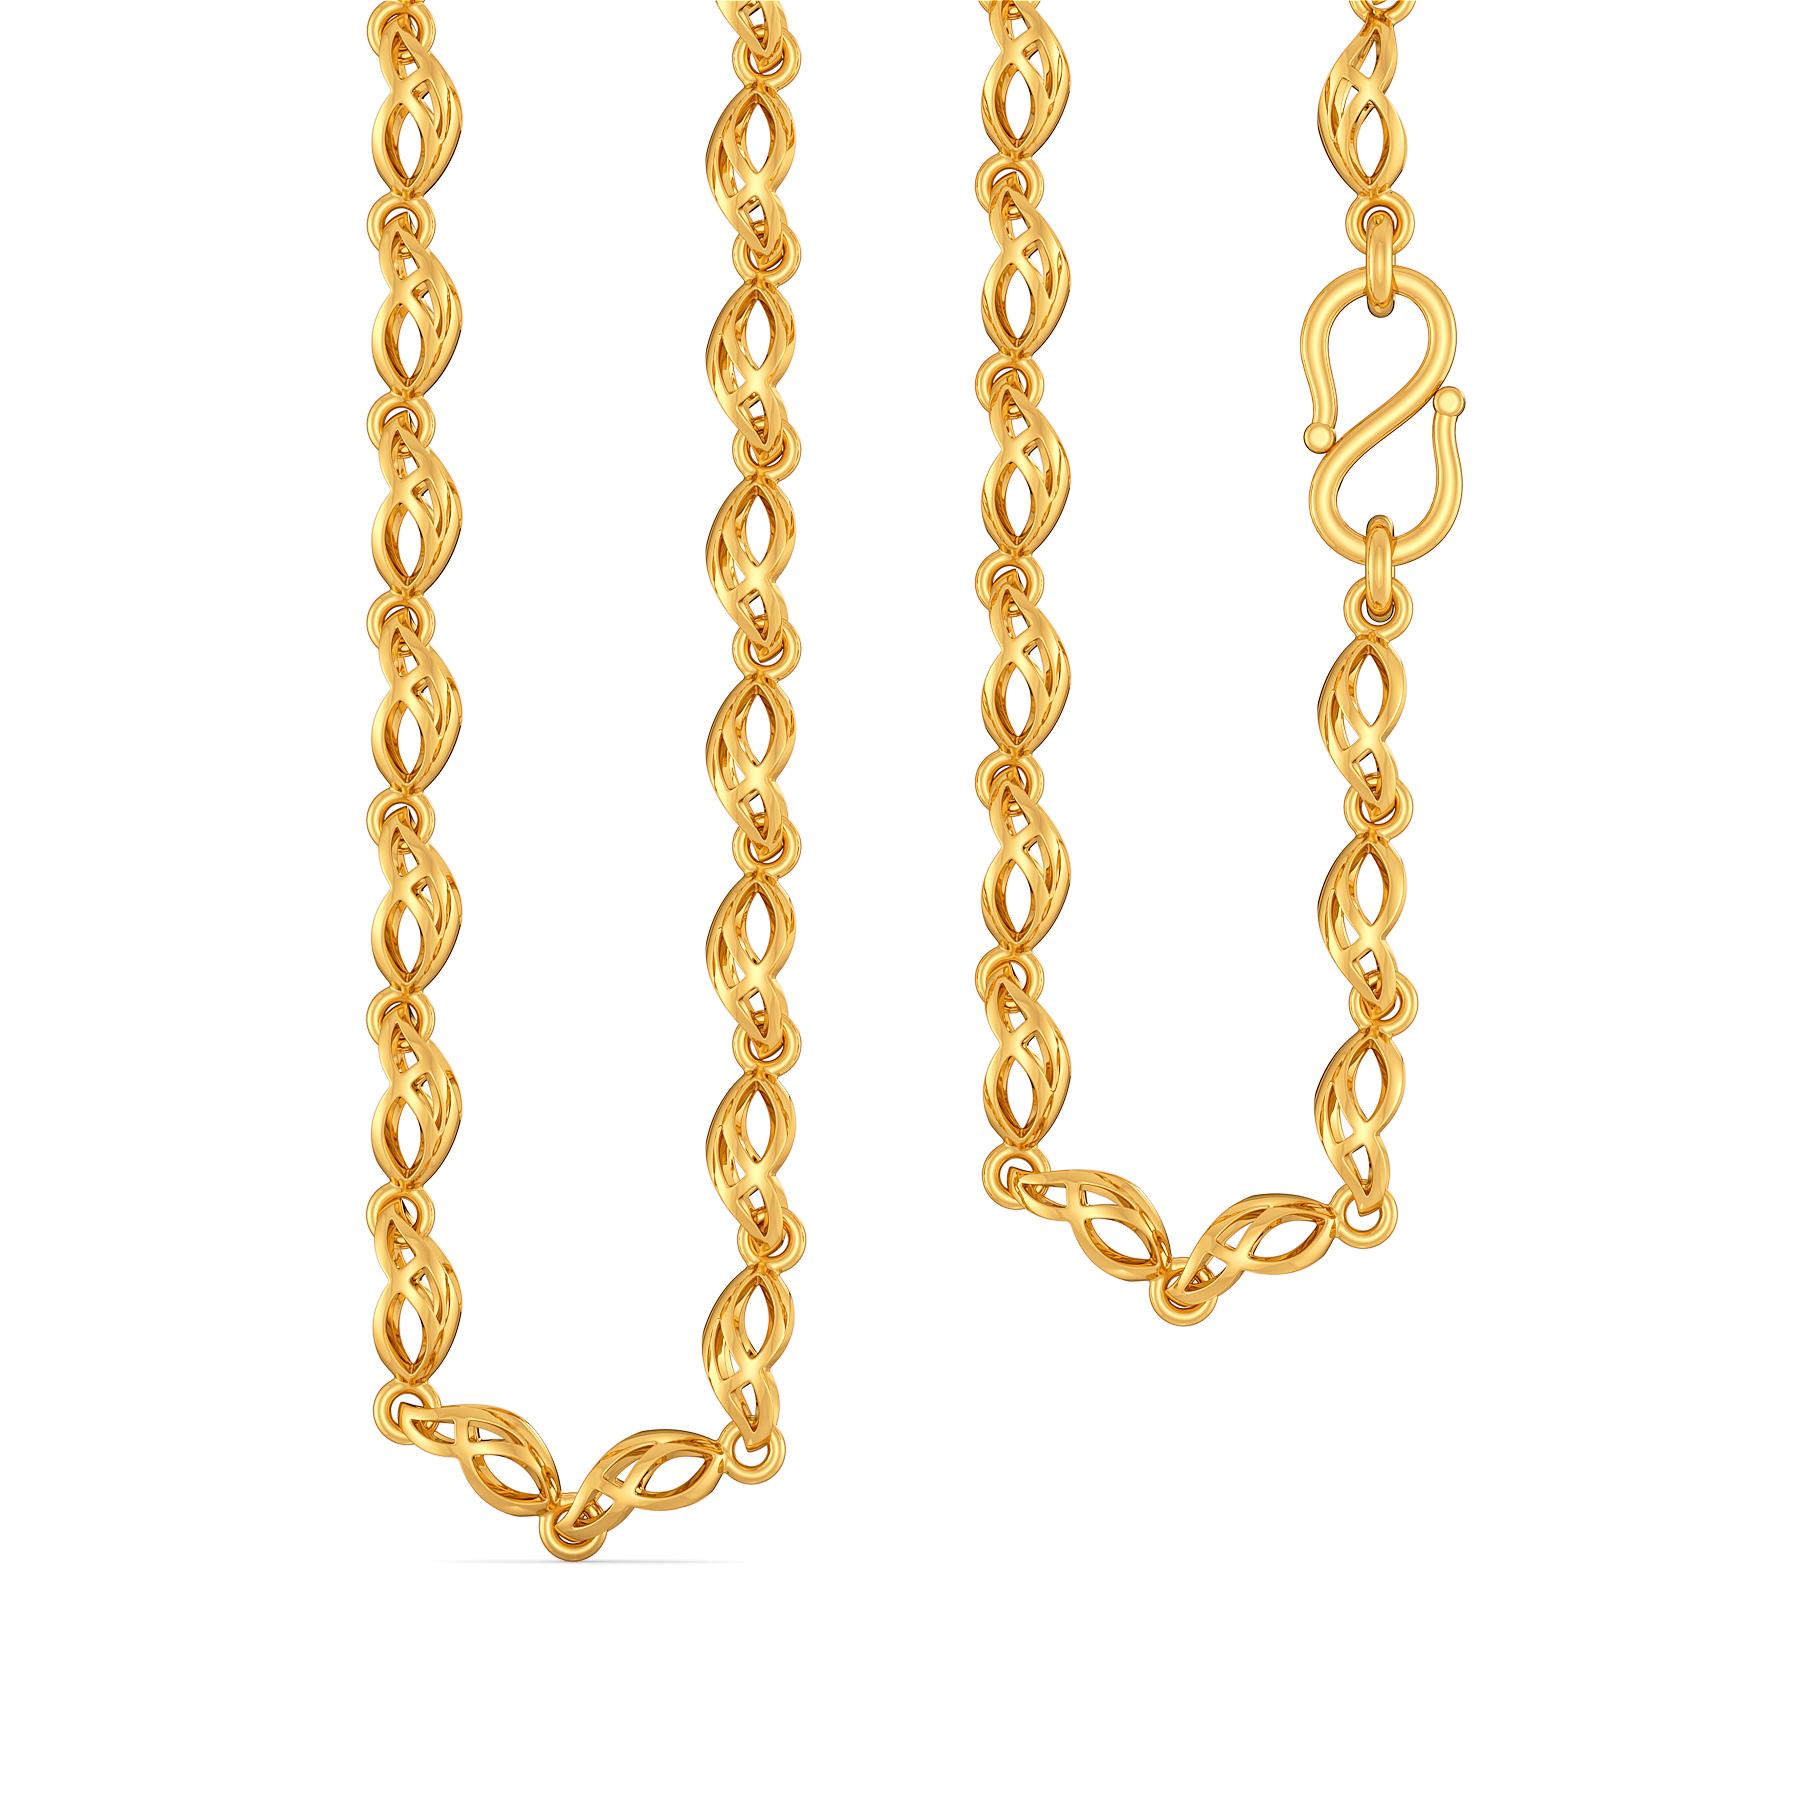 Mavey Wavy Gold Chains